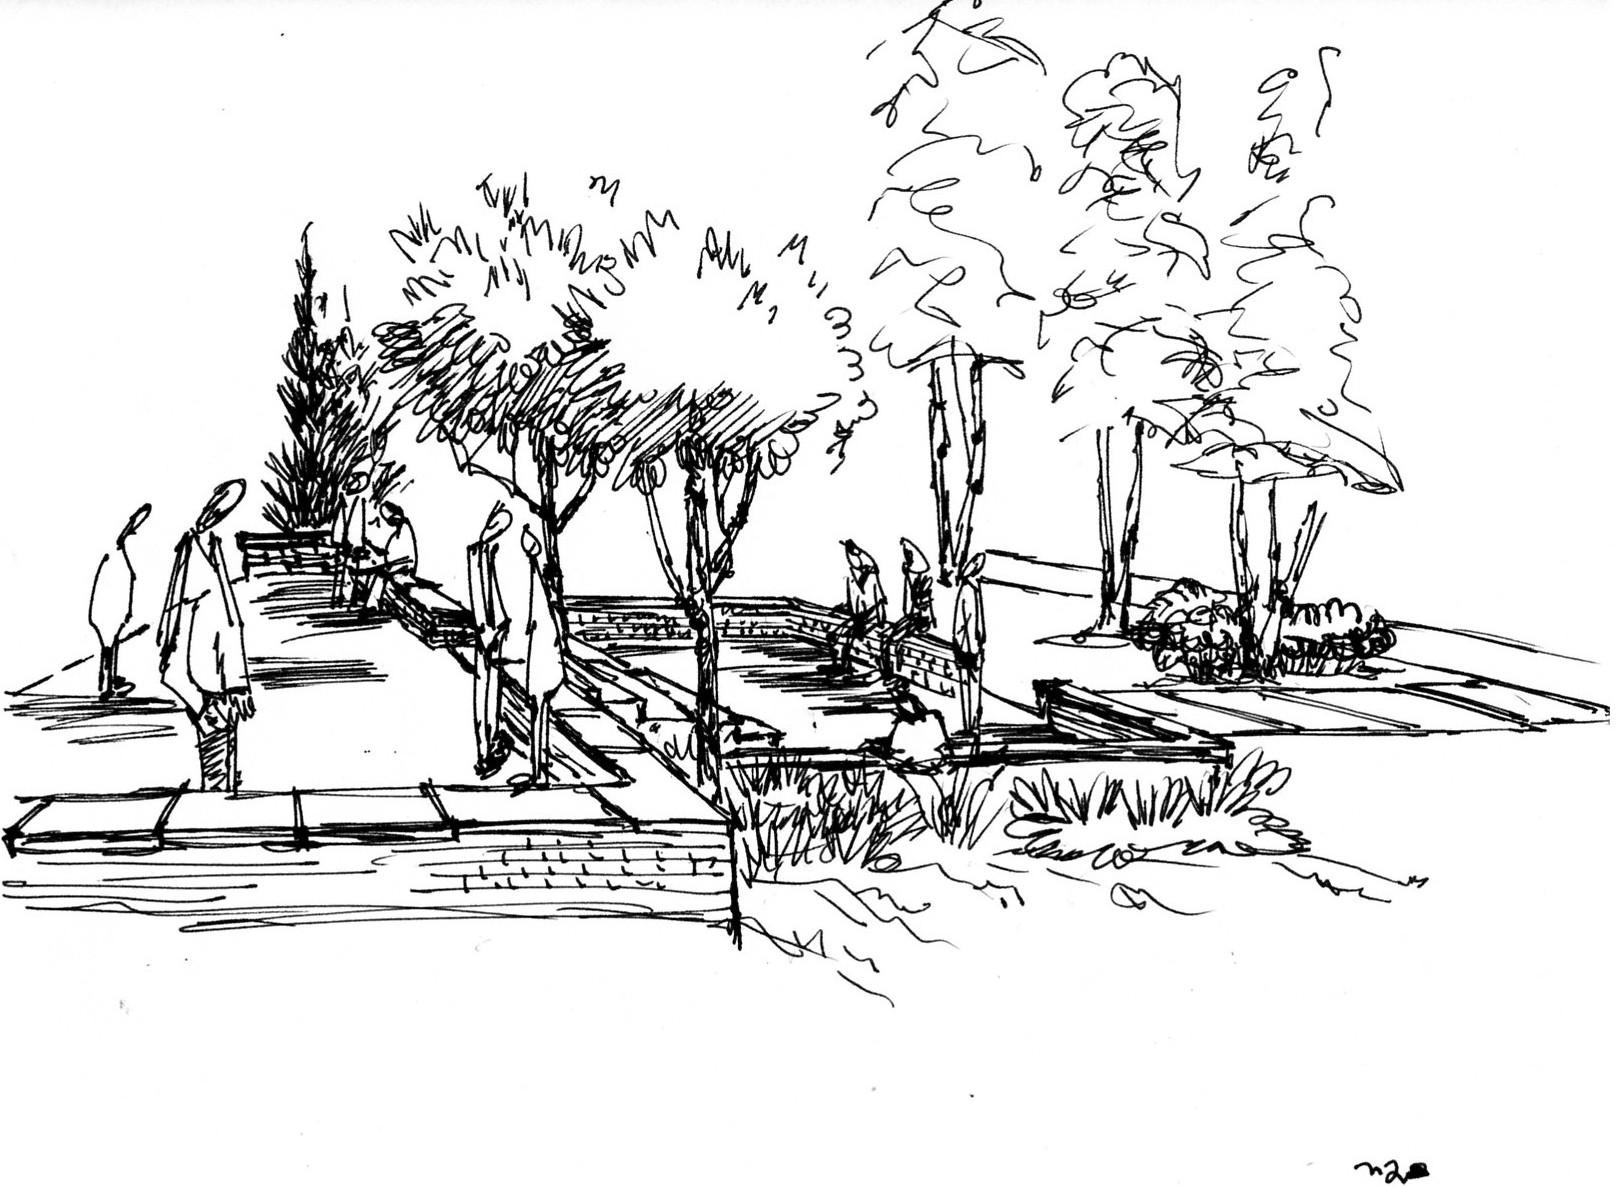 Line Drawing Landscape : Simple line drawing landscape imgkid the image